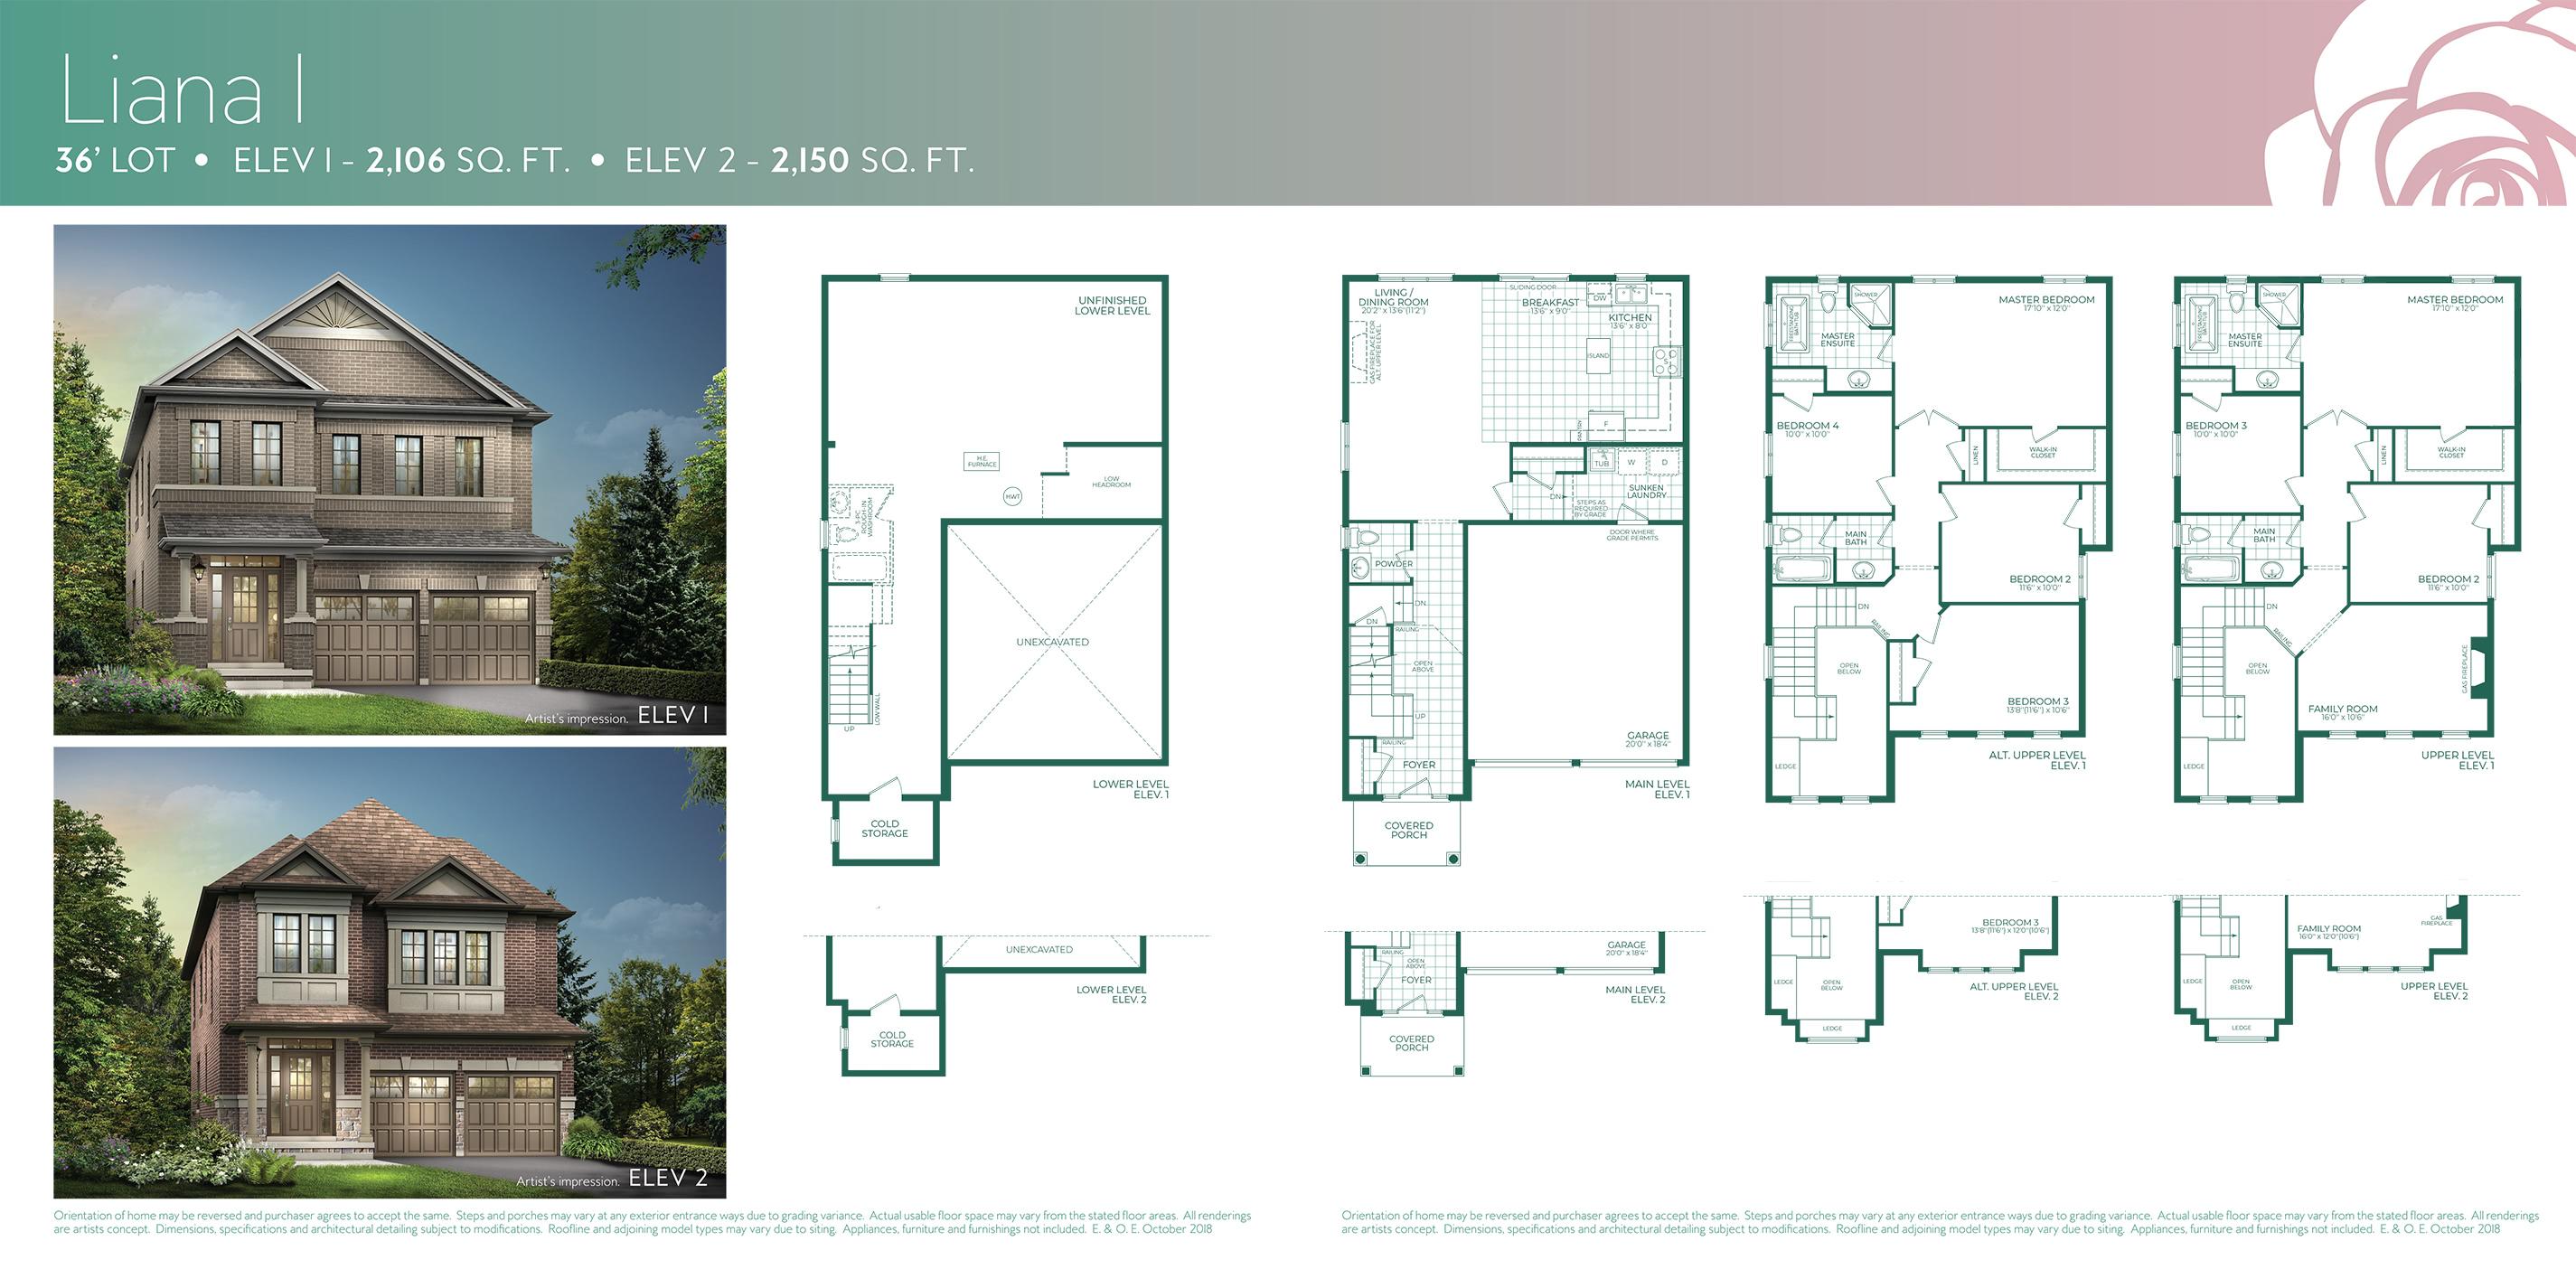 Liana 1 Floorplan